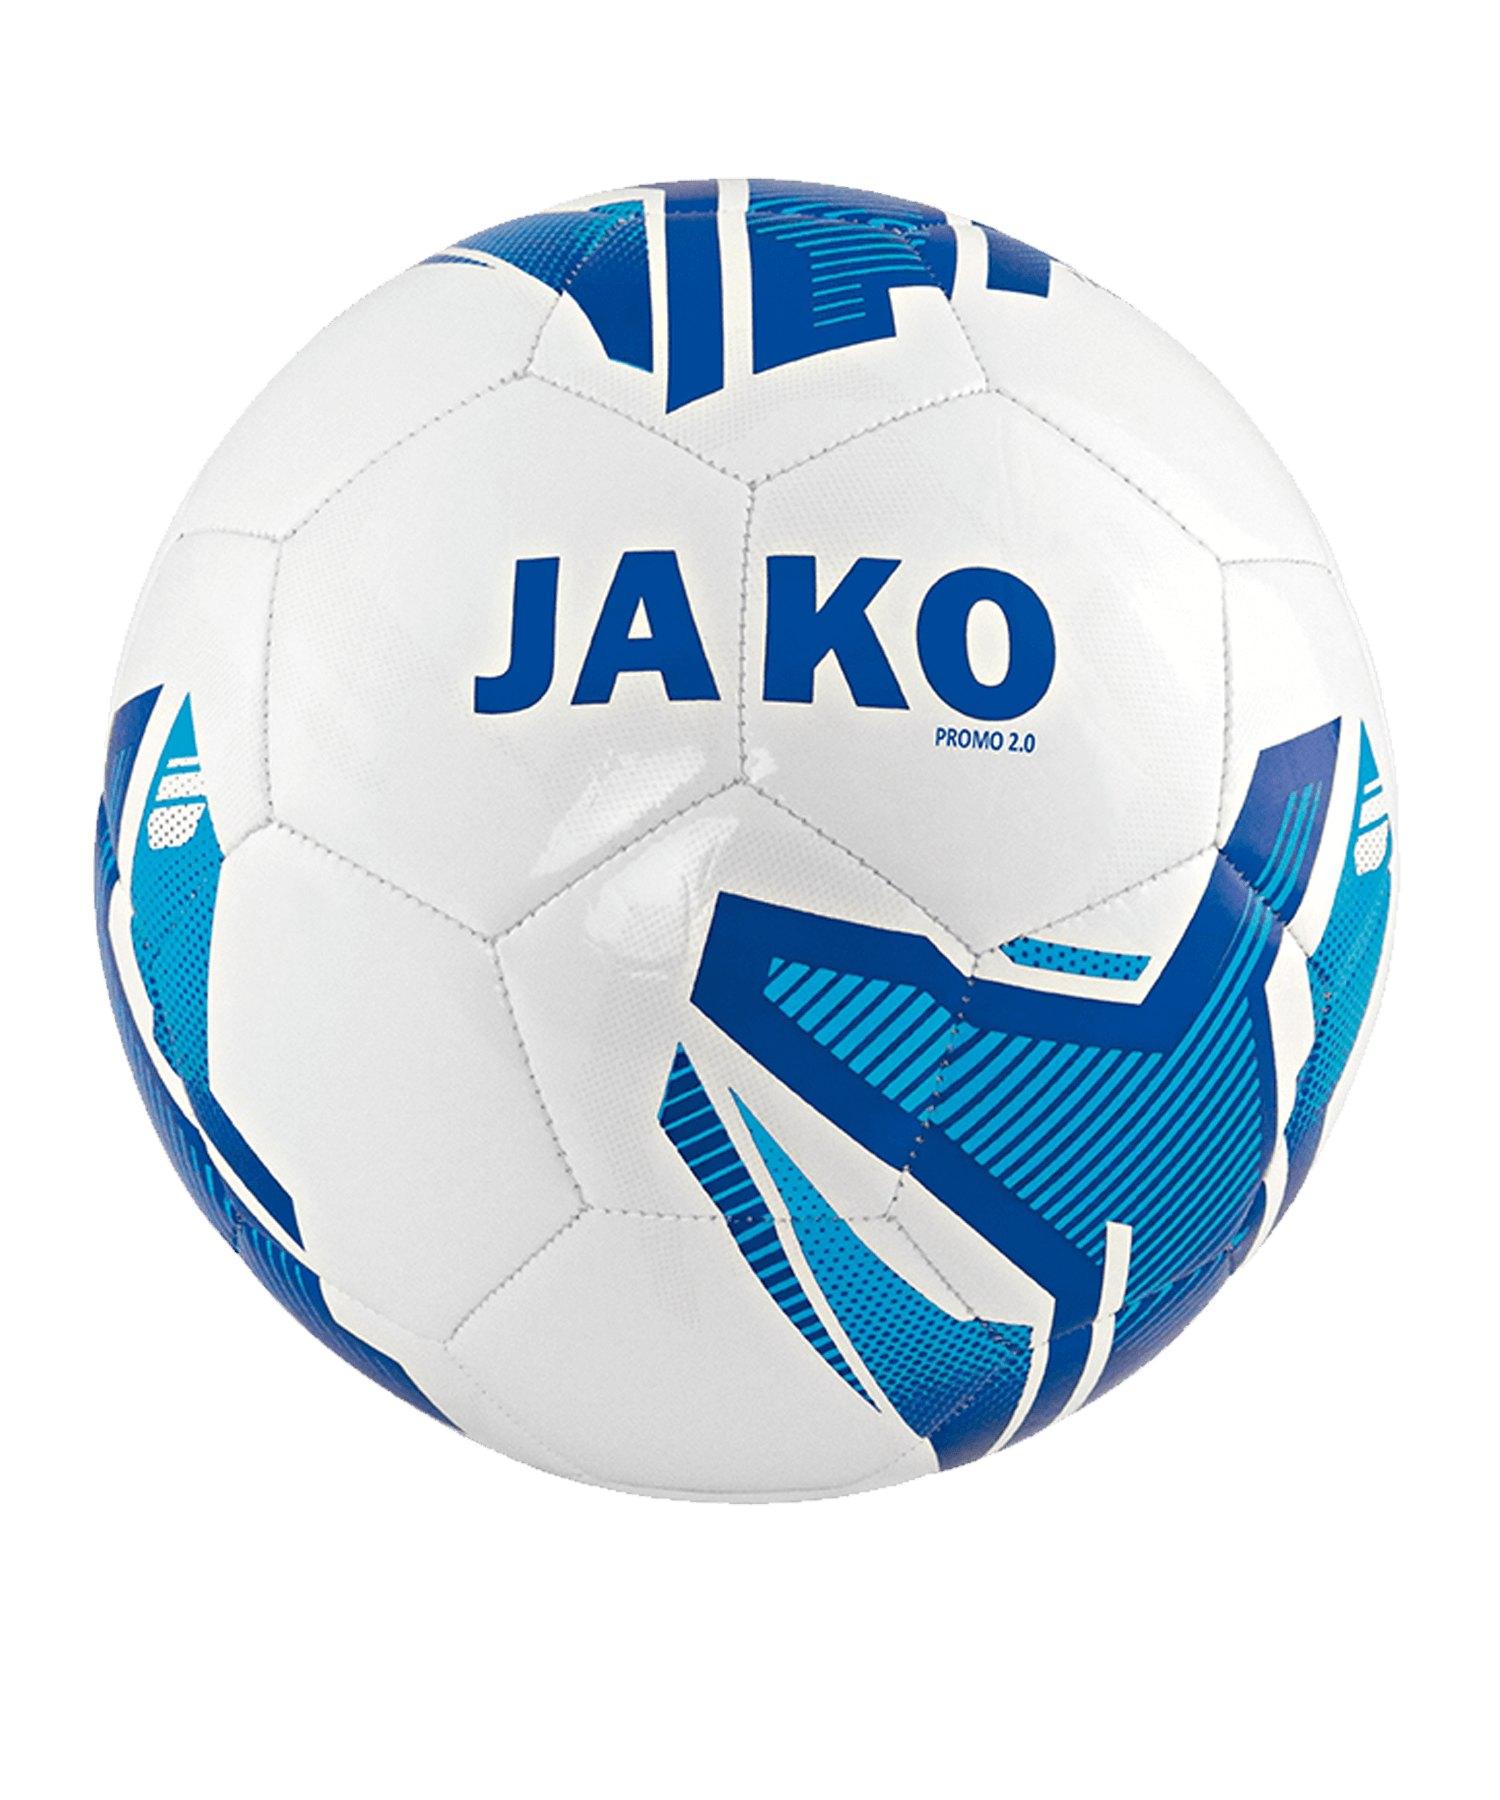 JAKO Promo 2.0 Trainingsball Weiss F04 - weiss